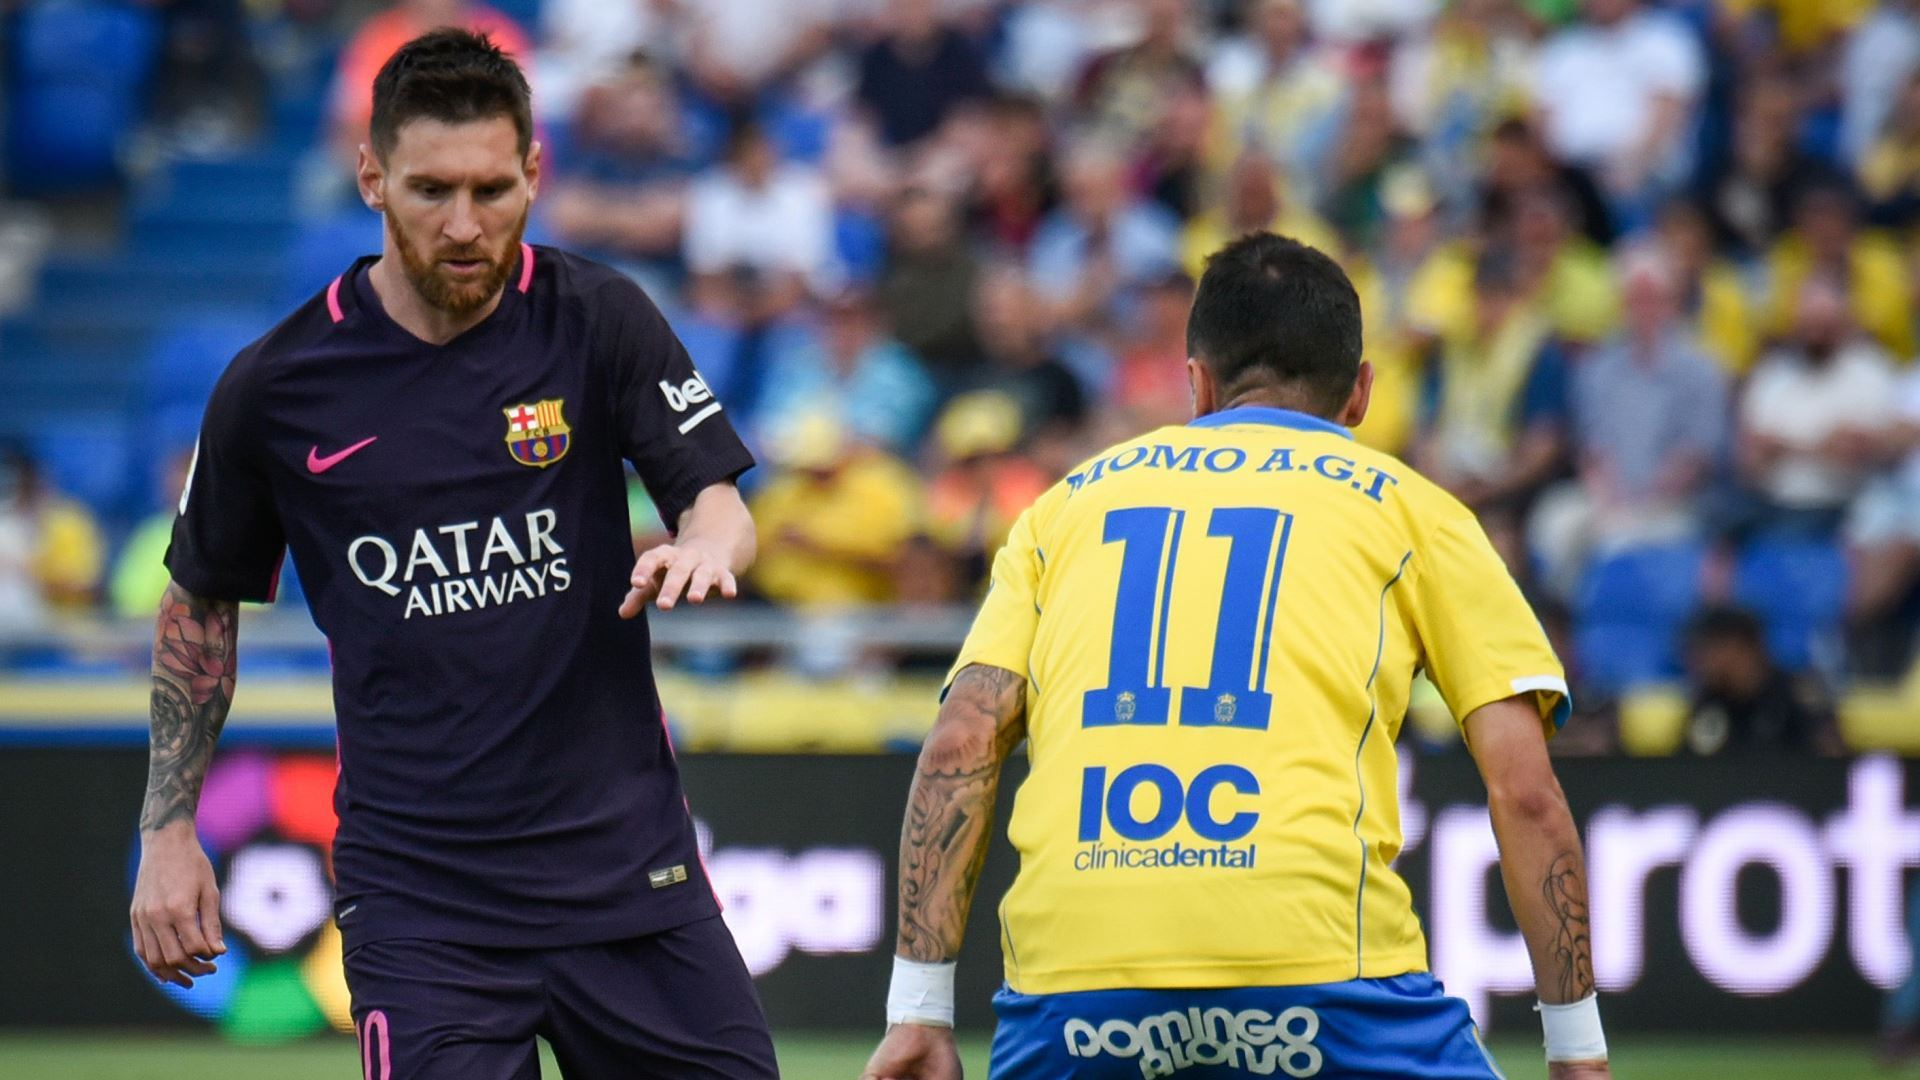 Lionel Messi Momo Las Palmas Barcelona LaLiga 14052017